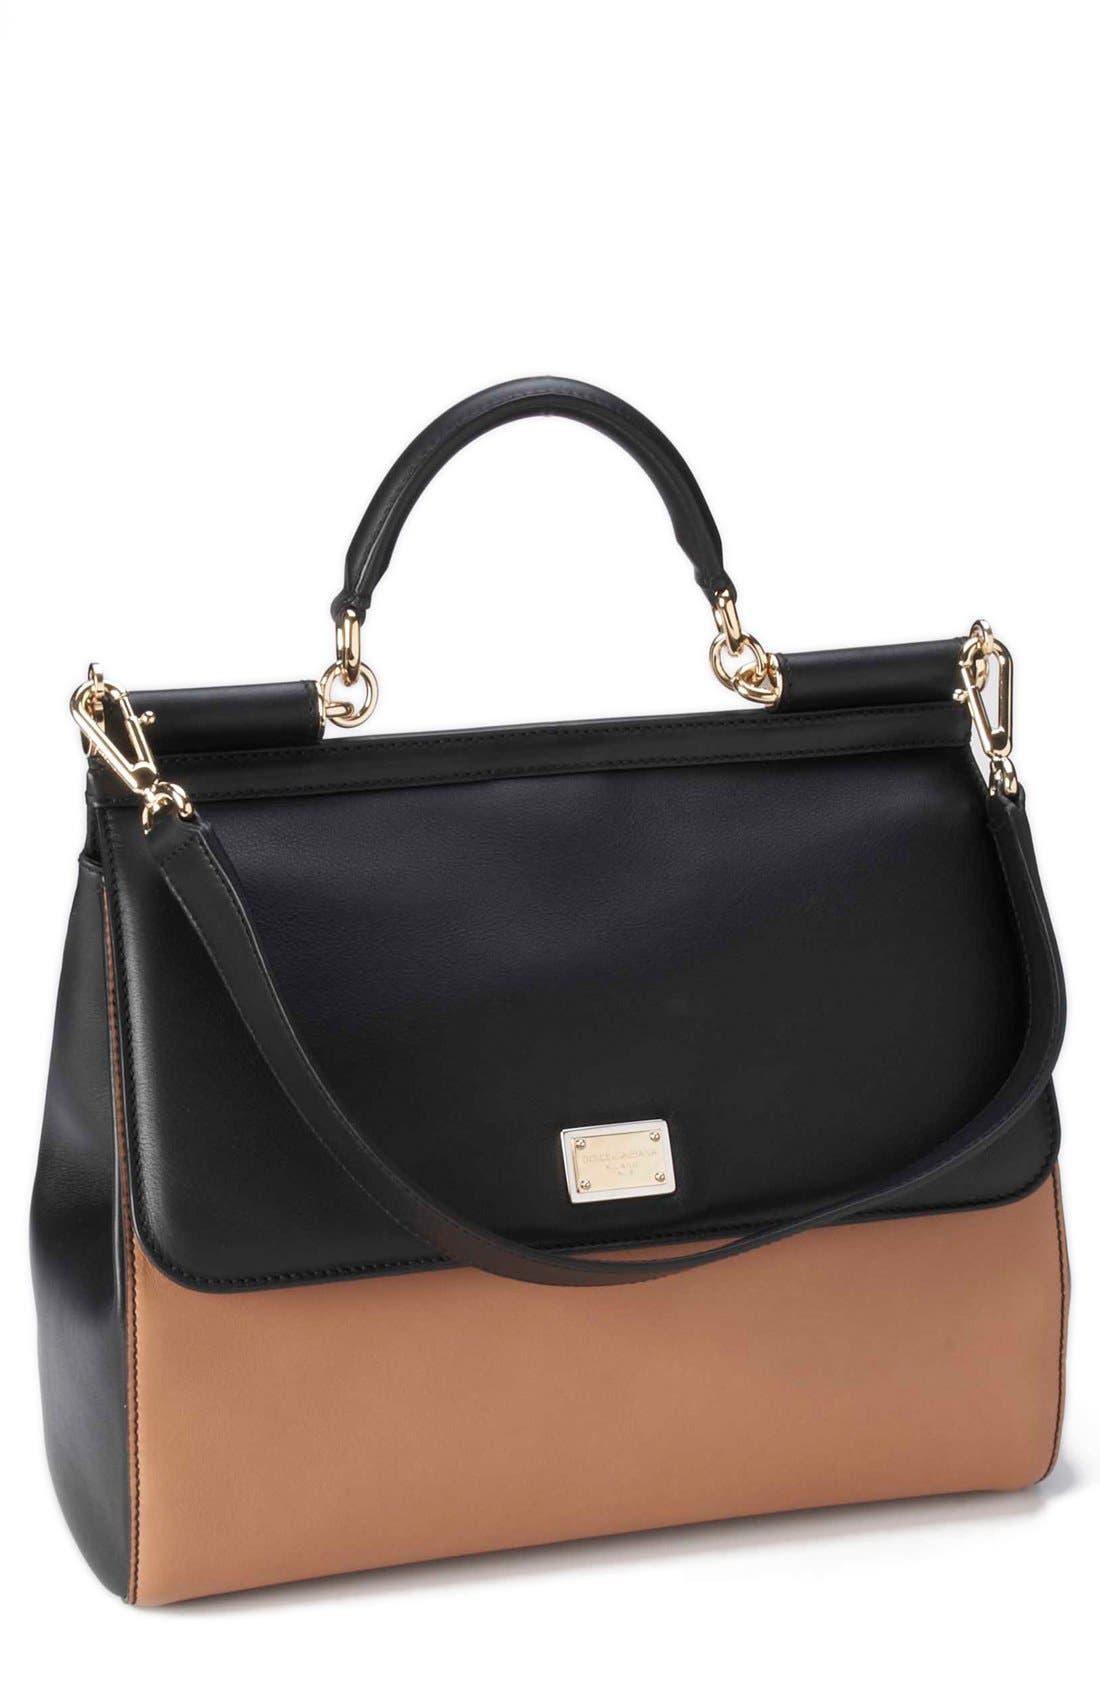 Alternate Image 1 Selected - Dolce&Gabbana 'Miss Sicily - Bi-Color' Top Handle Leather Satchel